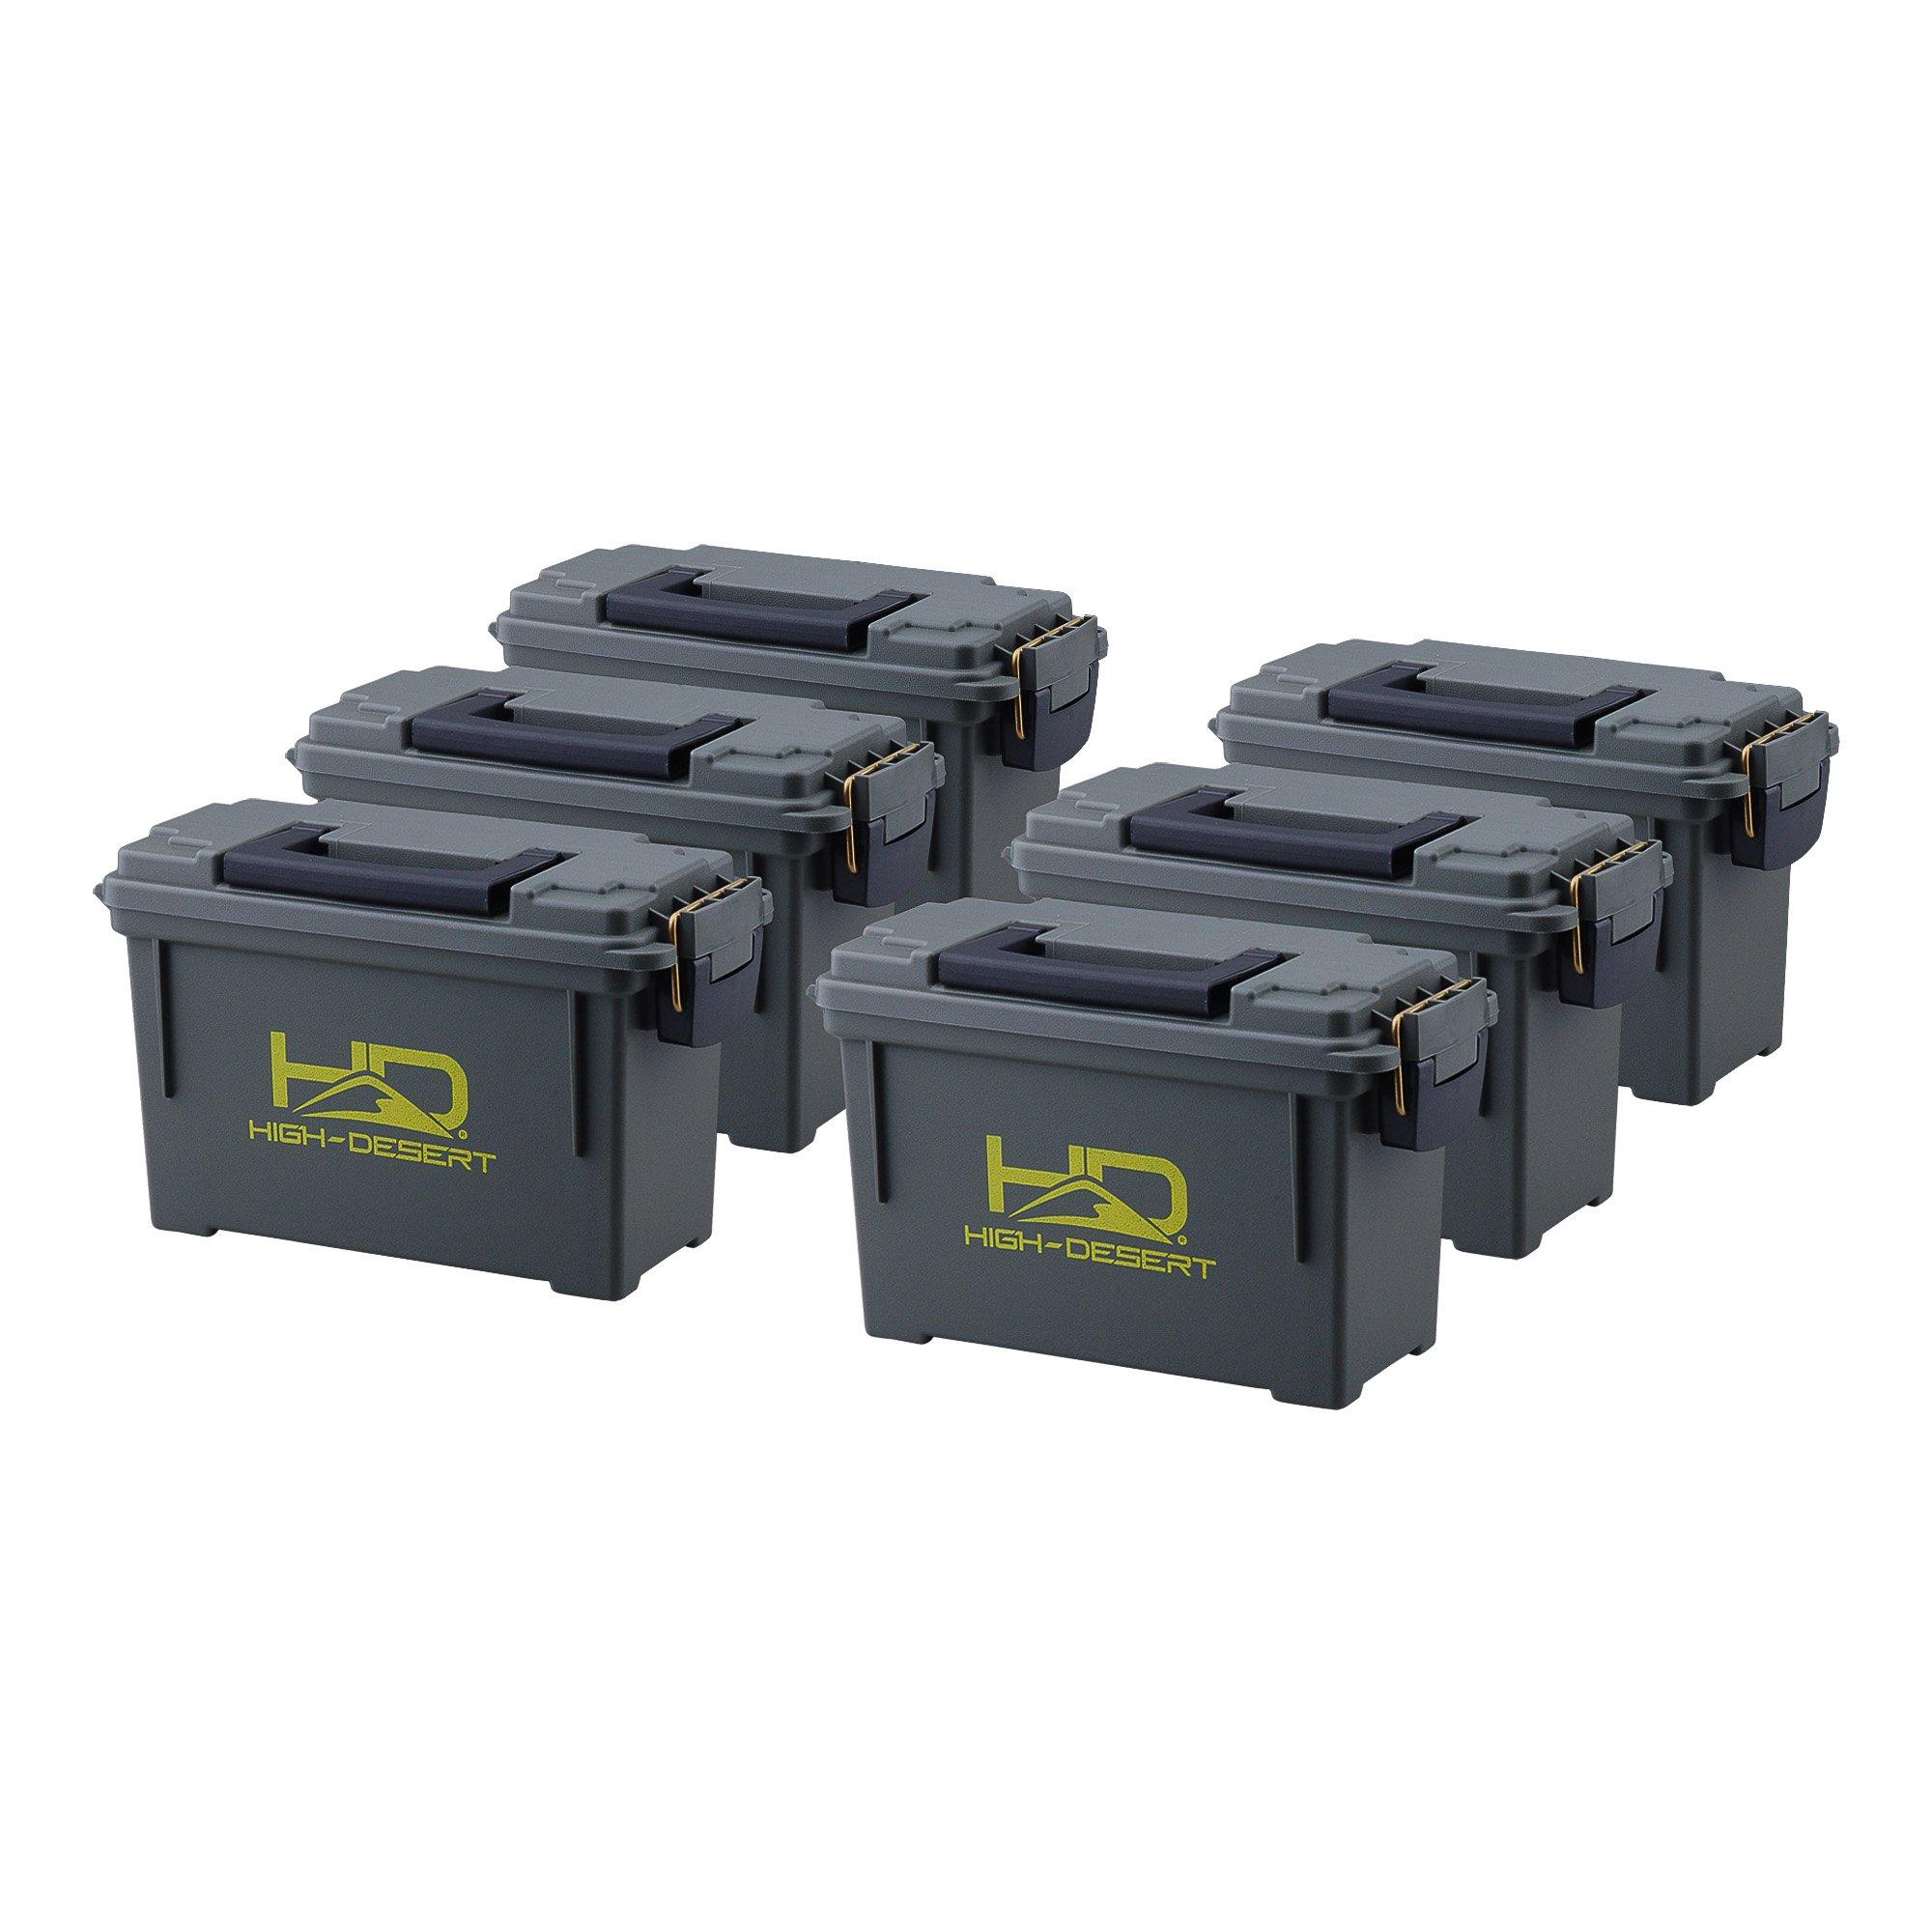 High Desert Plastic Ammo Boxes (6 Pack), Large